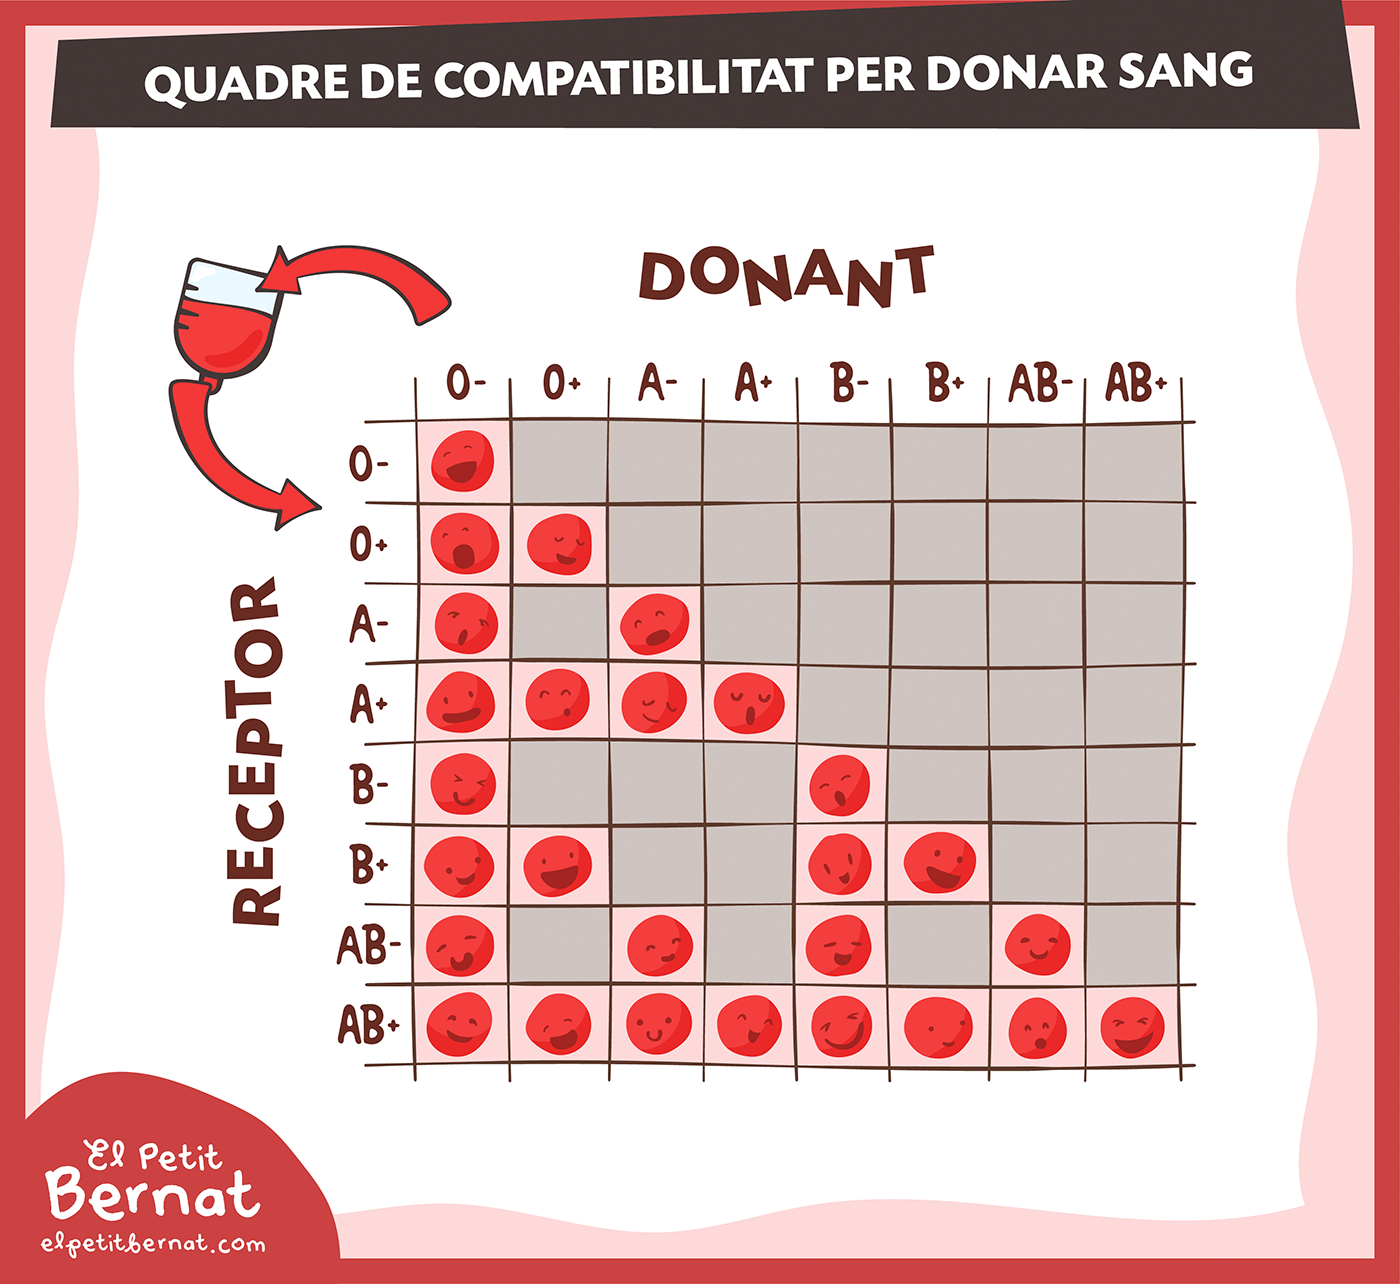 compatibilitat_de_grups_sanguinis